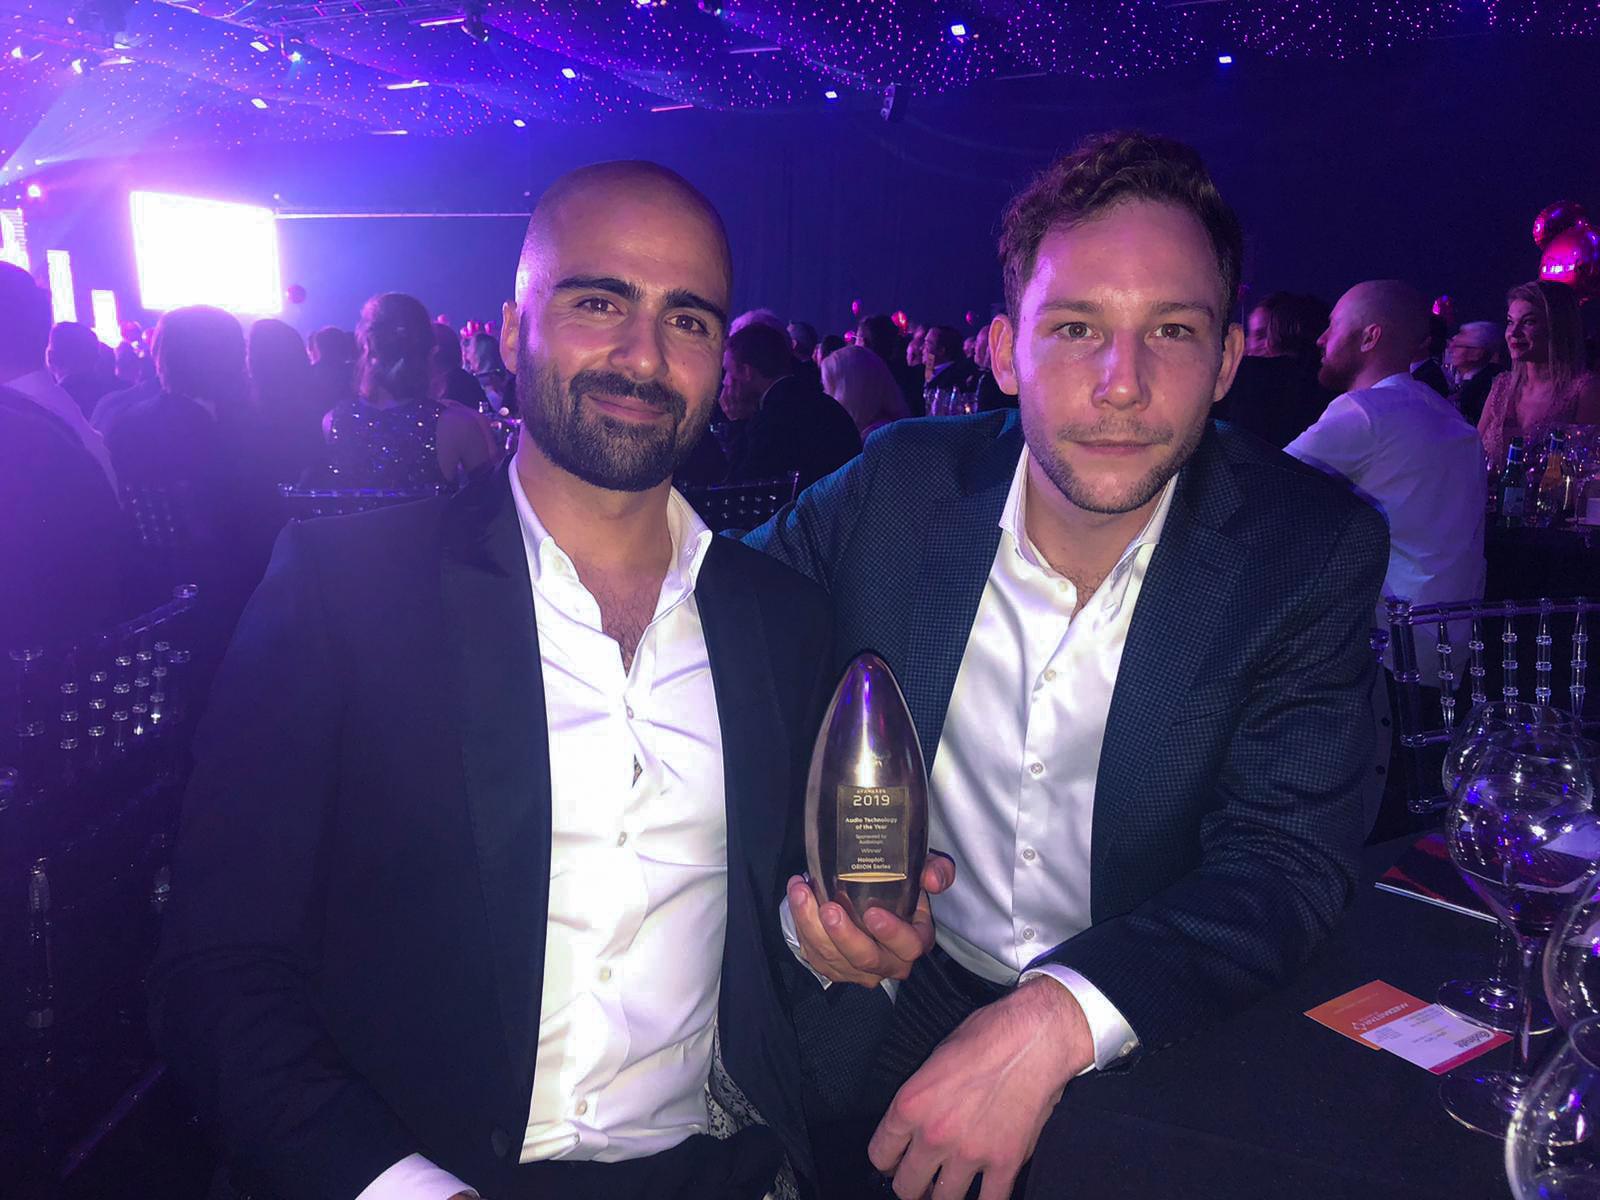 Roman Sick (CEO) and Tobias Wulf (Senior Growth Manager) from Holoplot at the AV Award 2019 Ceremony. Photo: Holoplot GmbH